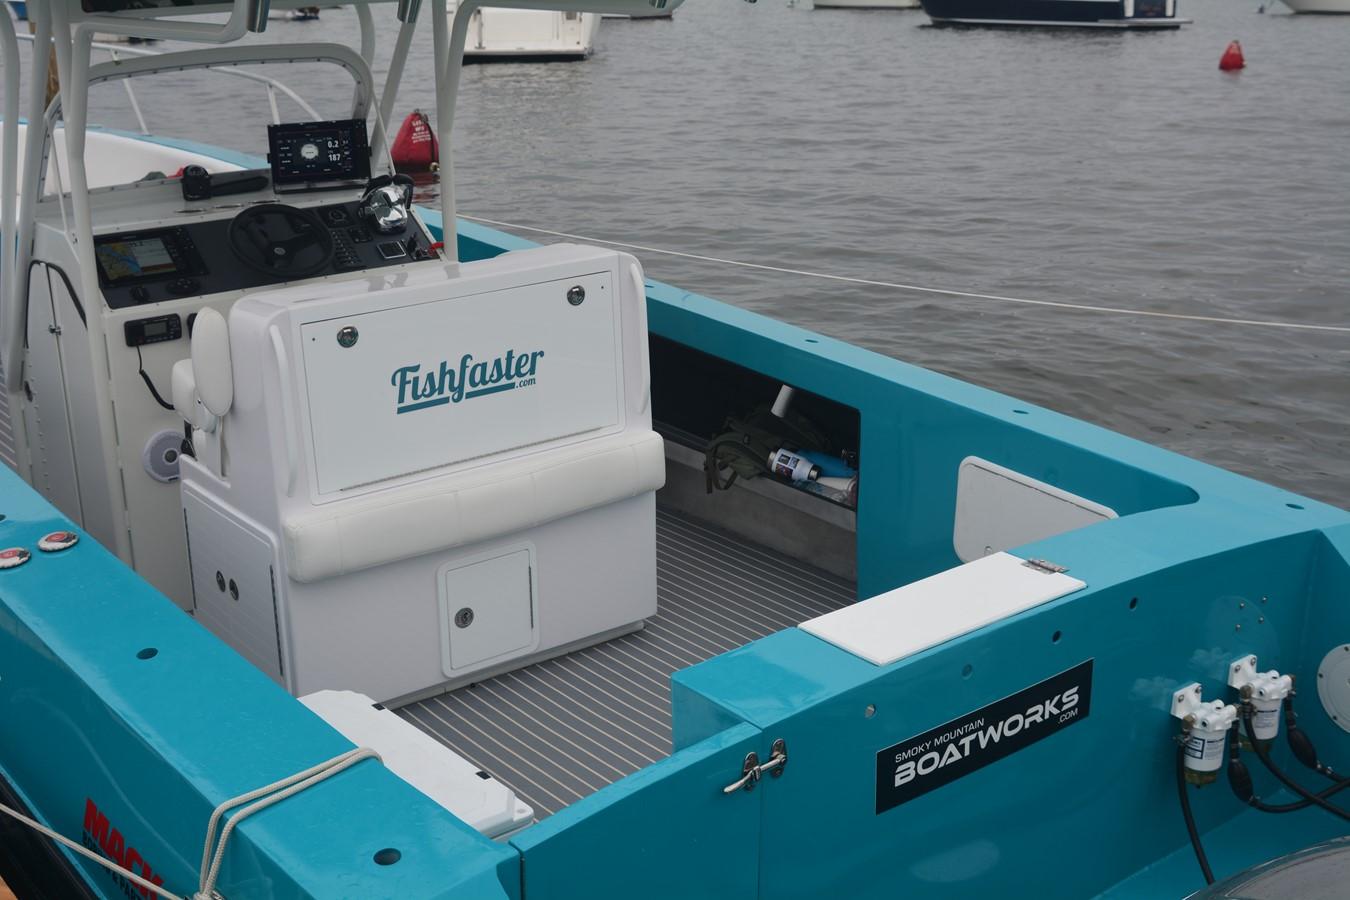 fishfaster33.rearinterior.JPG 2019 CUSTOM   2310282